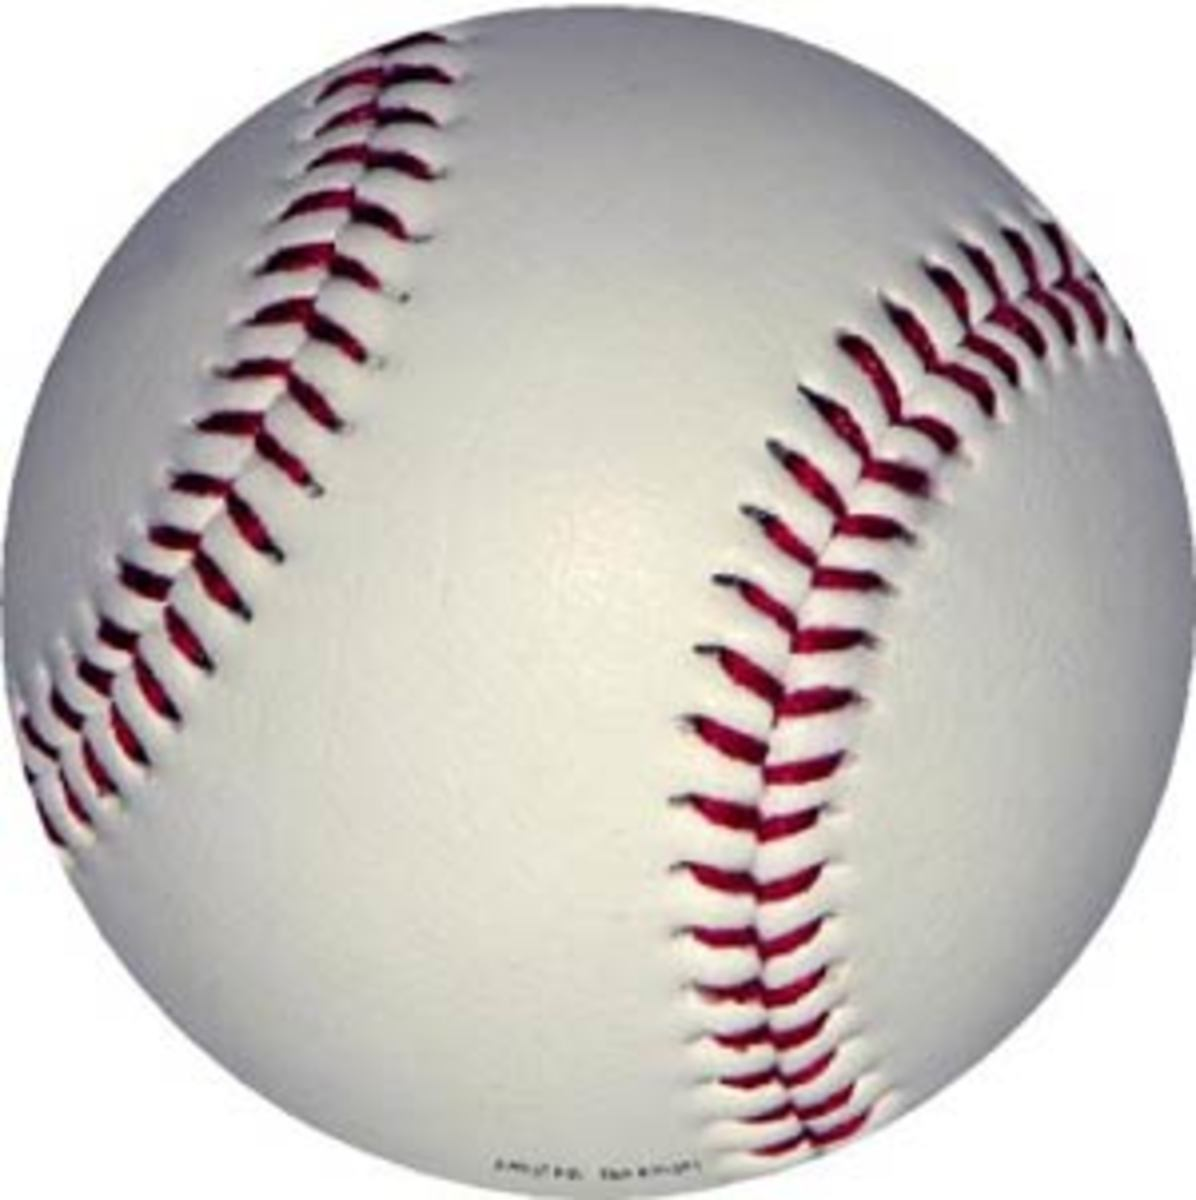 baseball-hitting-drills-perfecting-a-baseball-swing